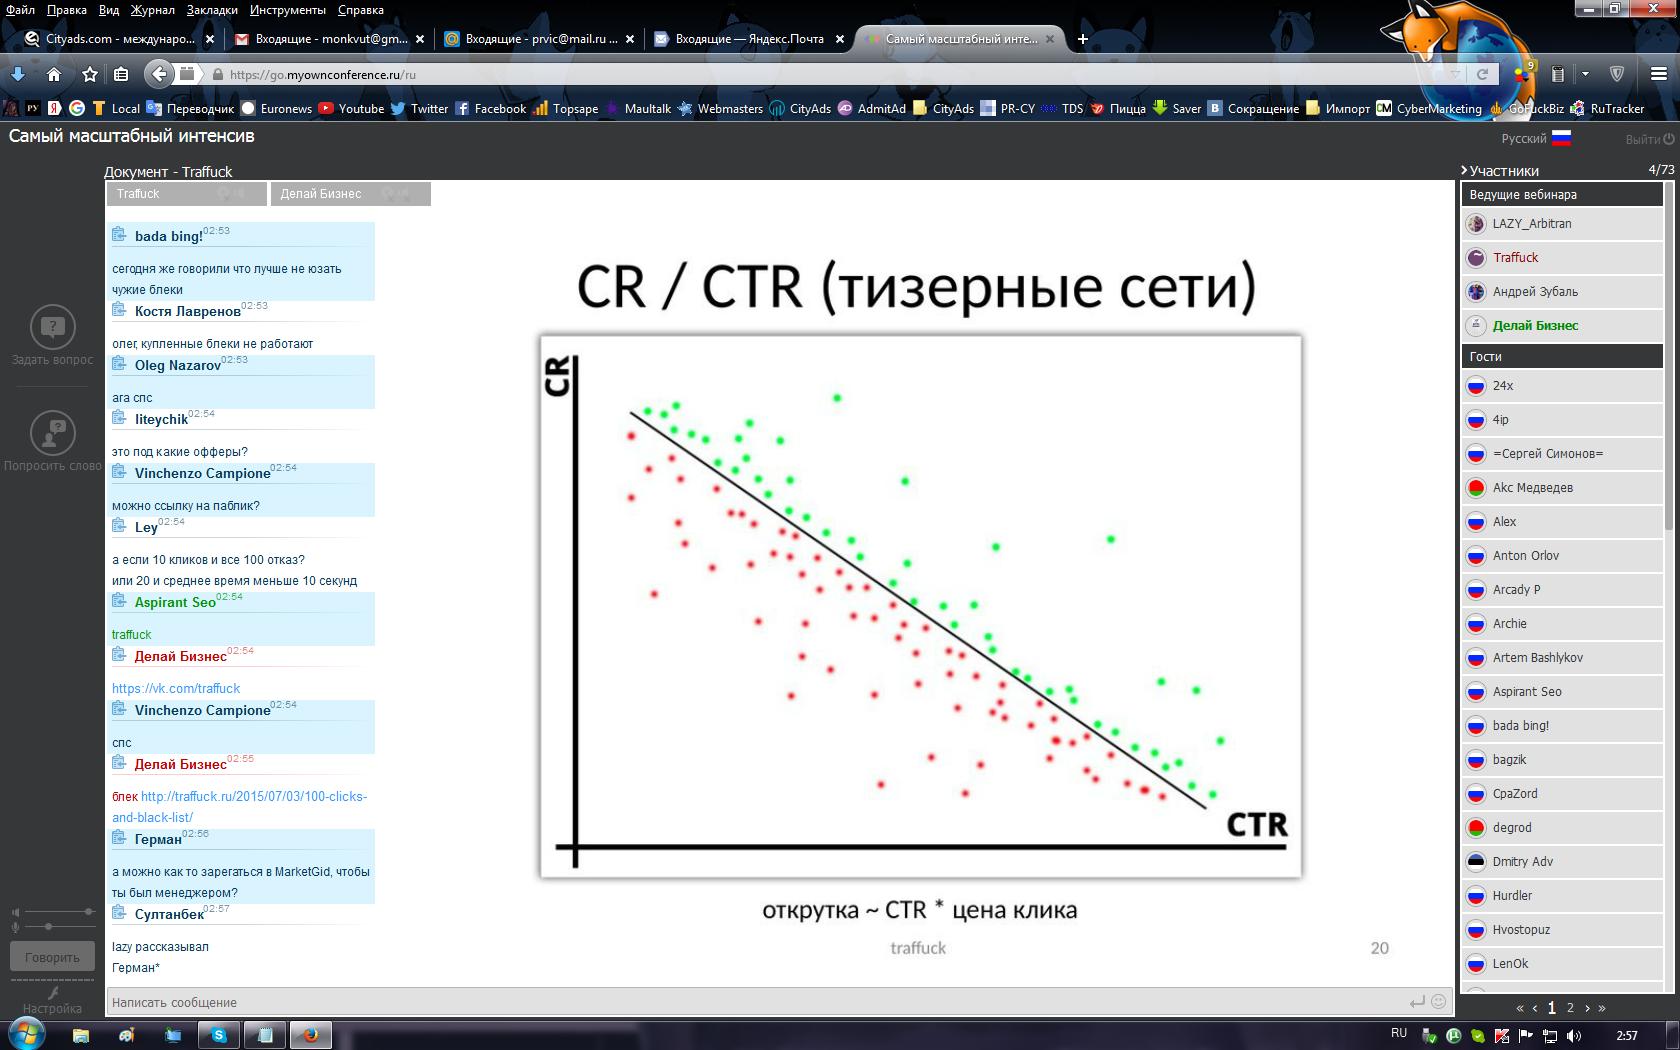 CR/CTR